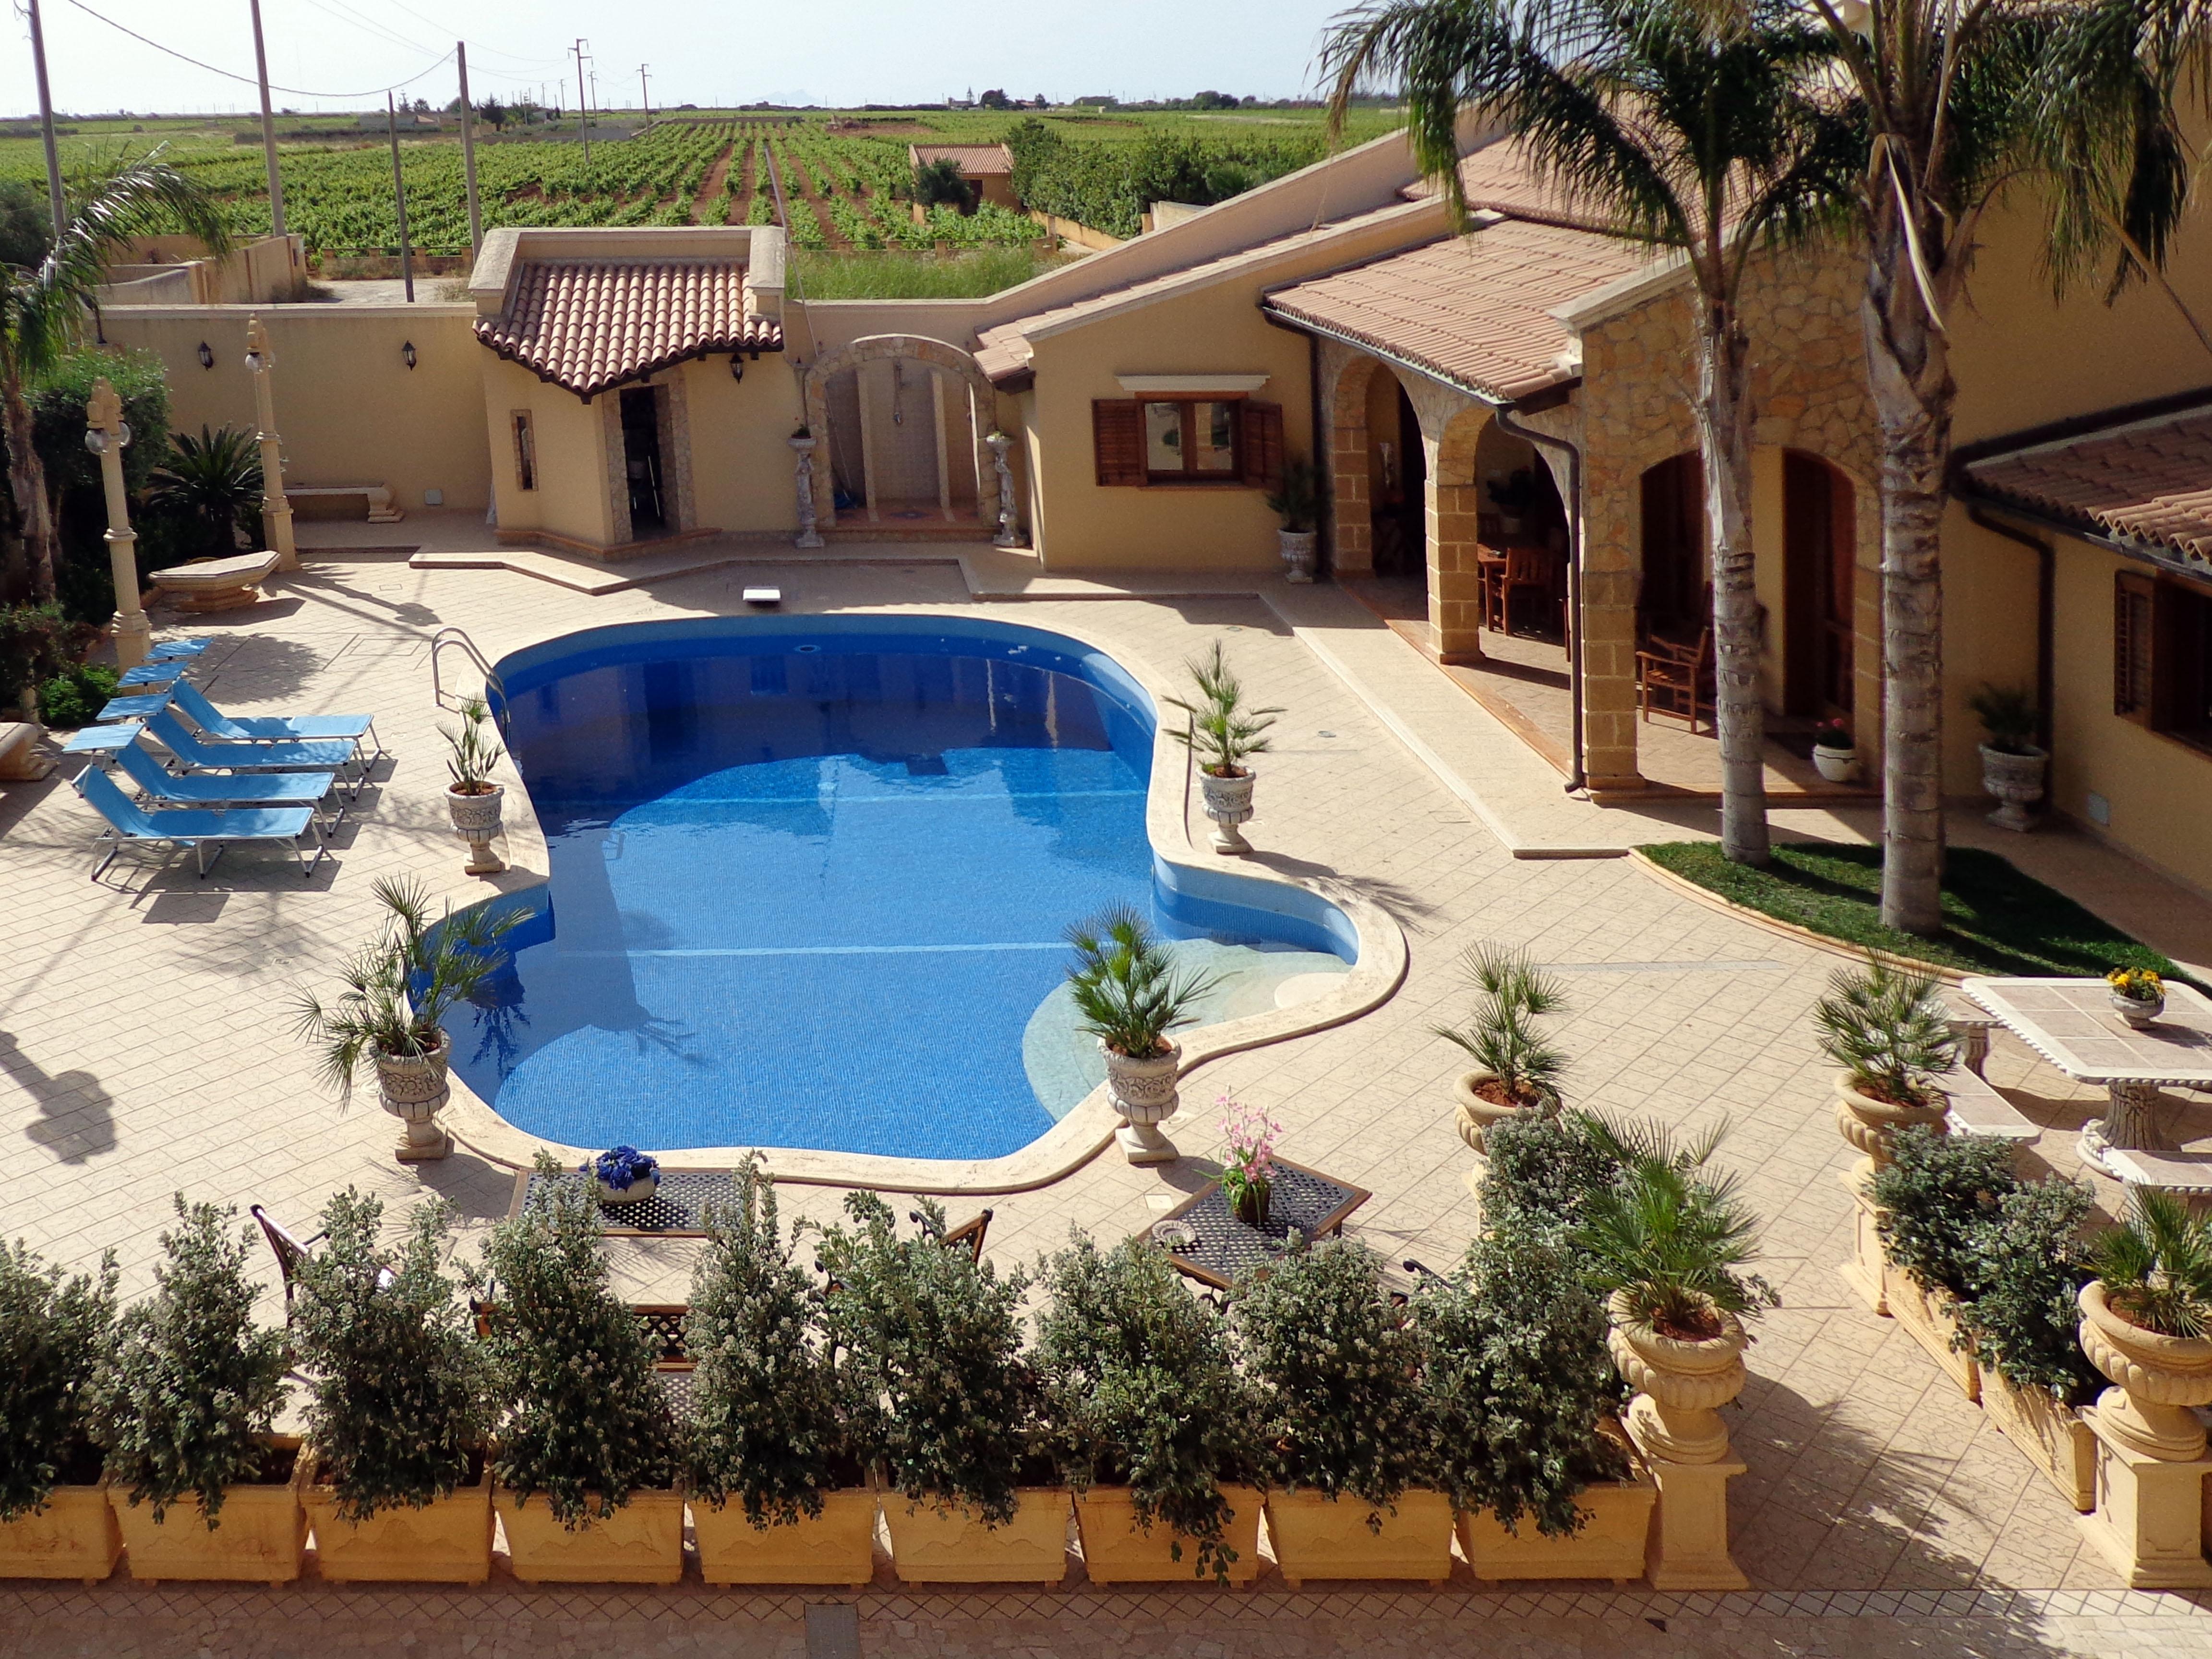 Affittasi location villa margherita lusso con piscina miragu for Piscina di lusso